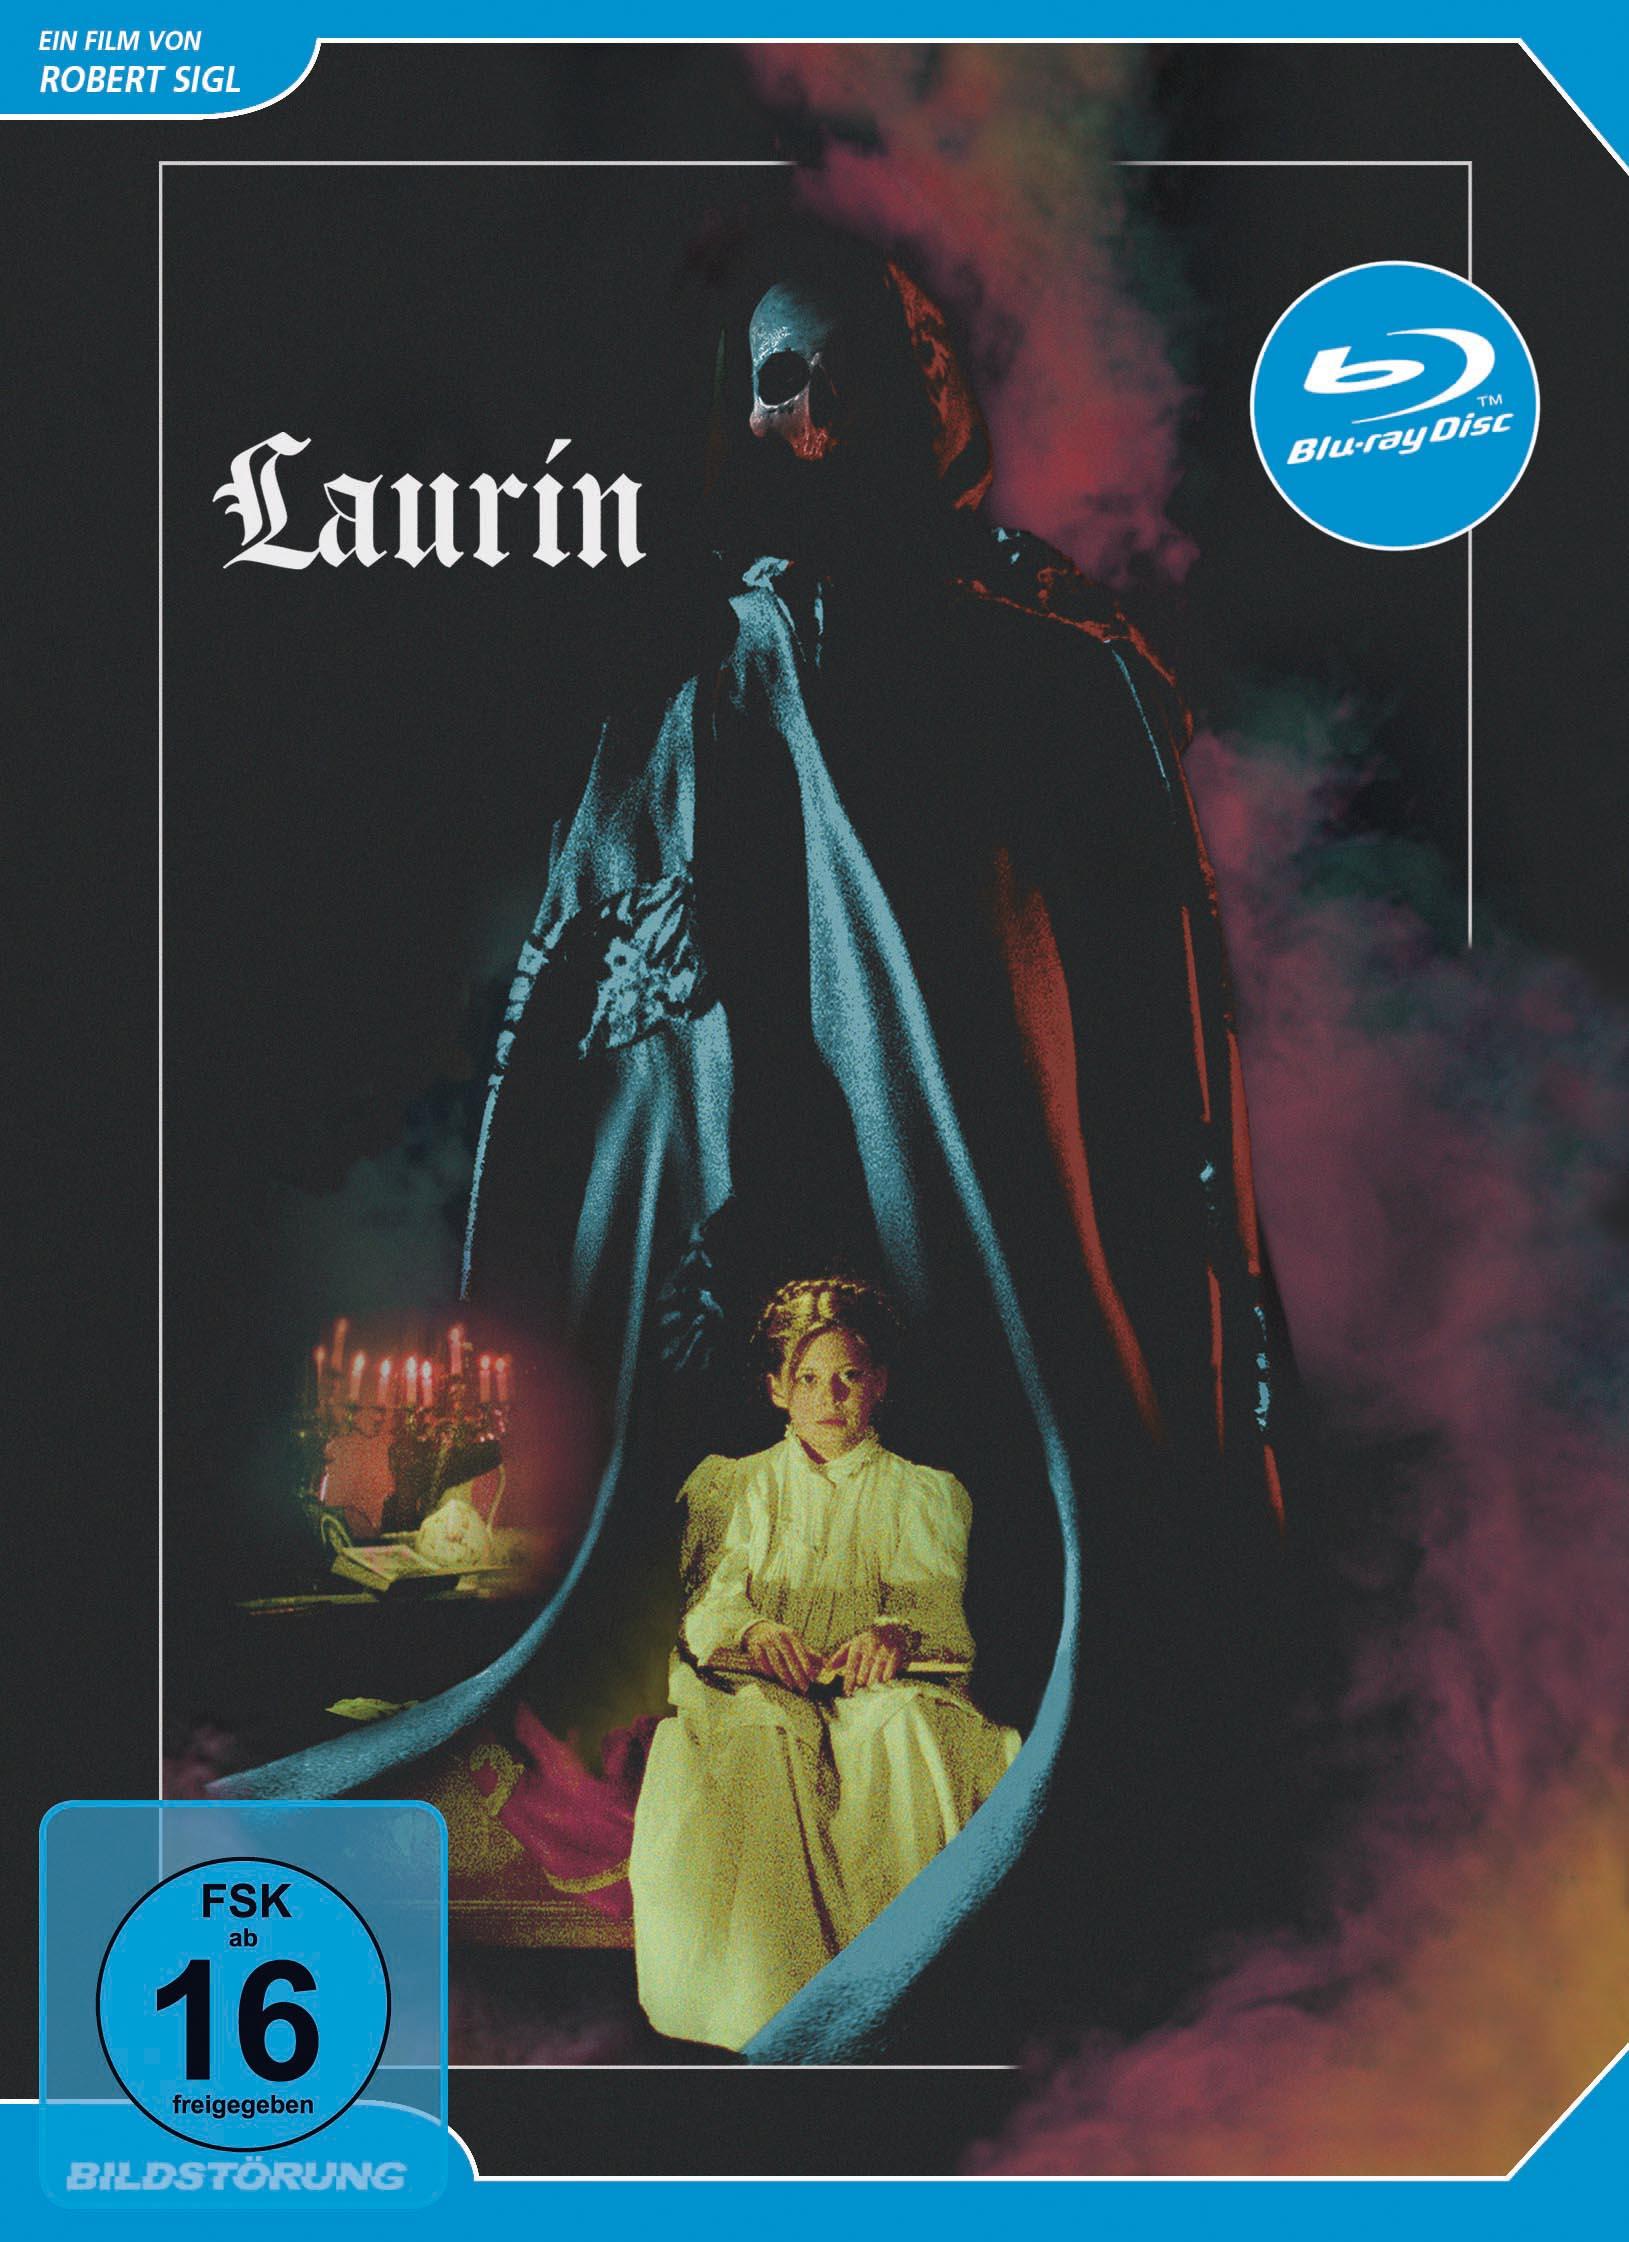 Blu-ray 2D